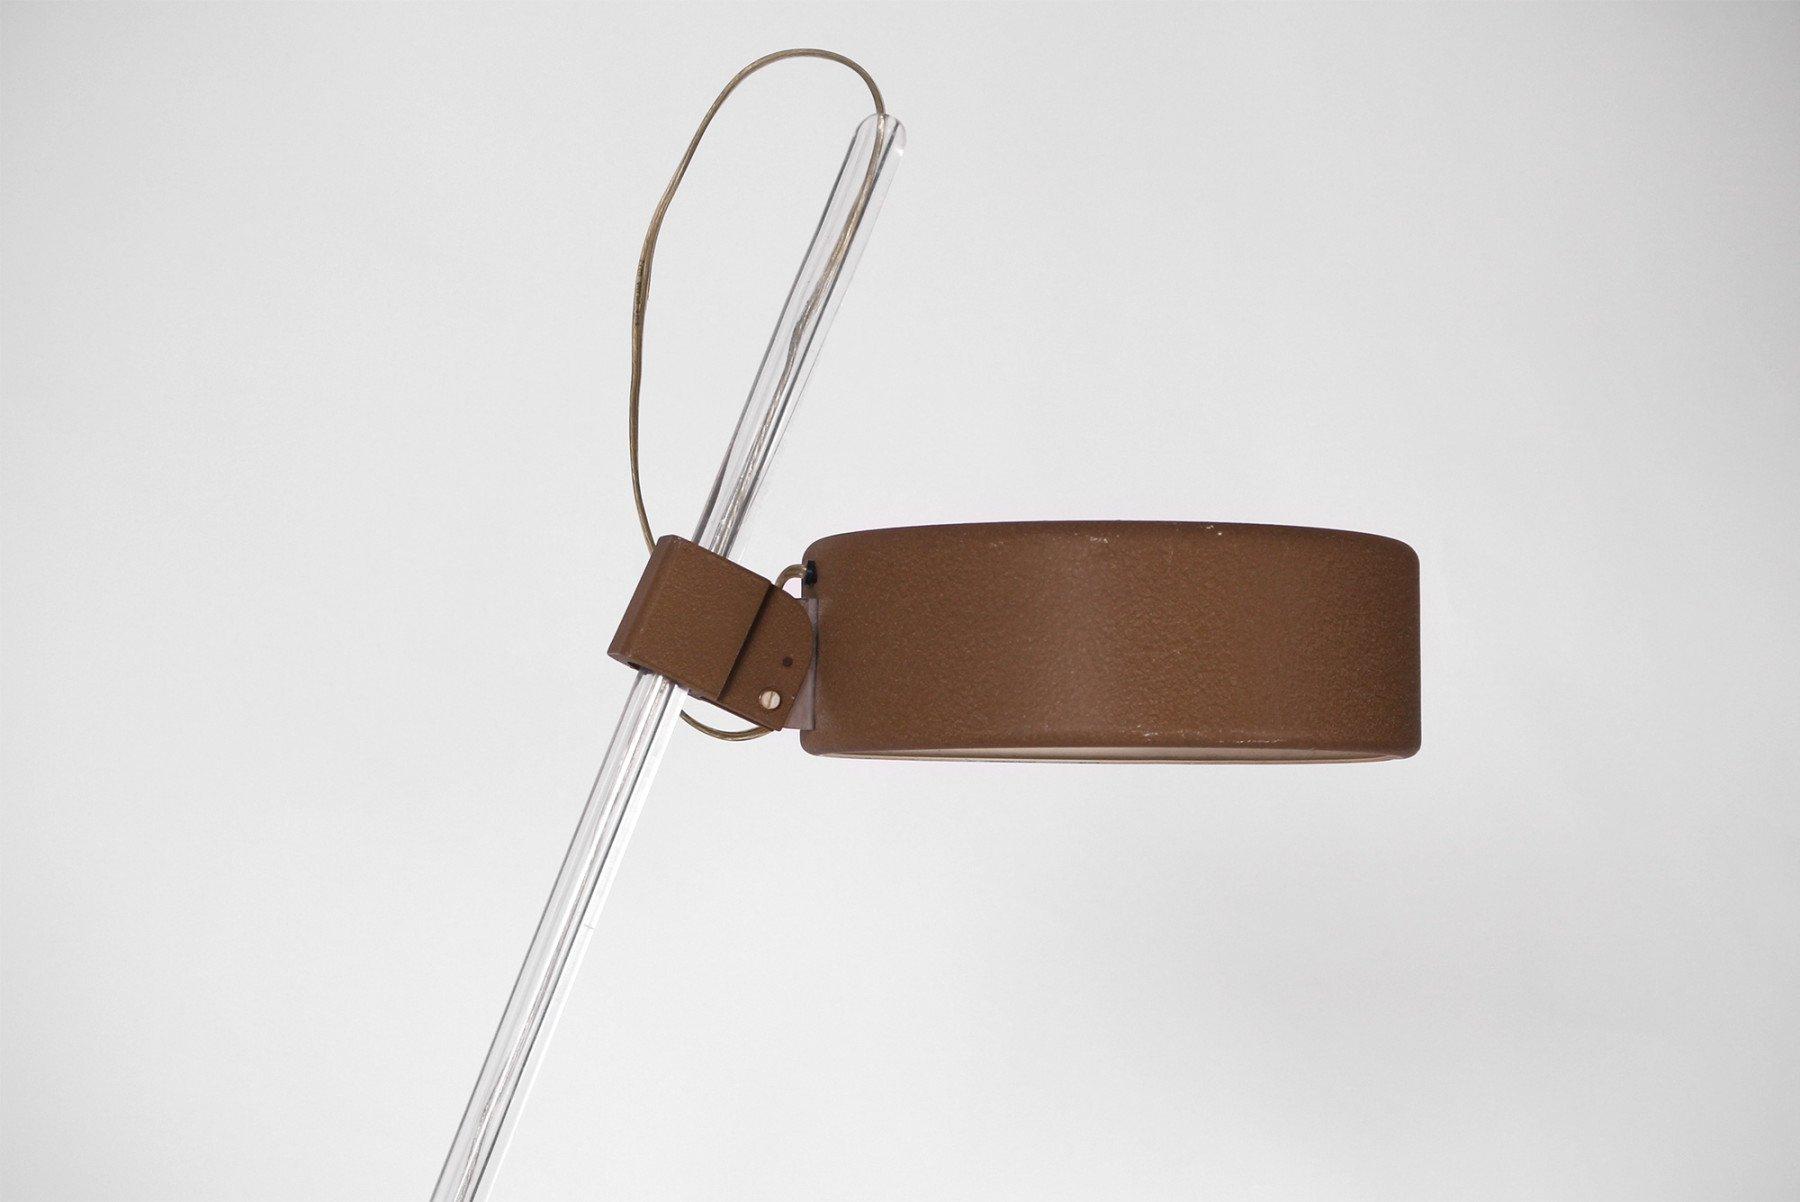 Gino Sarfatti |   Desk lamp, model 606